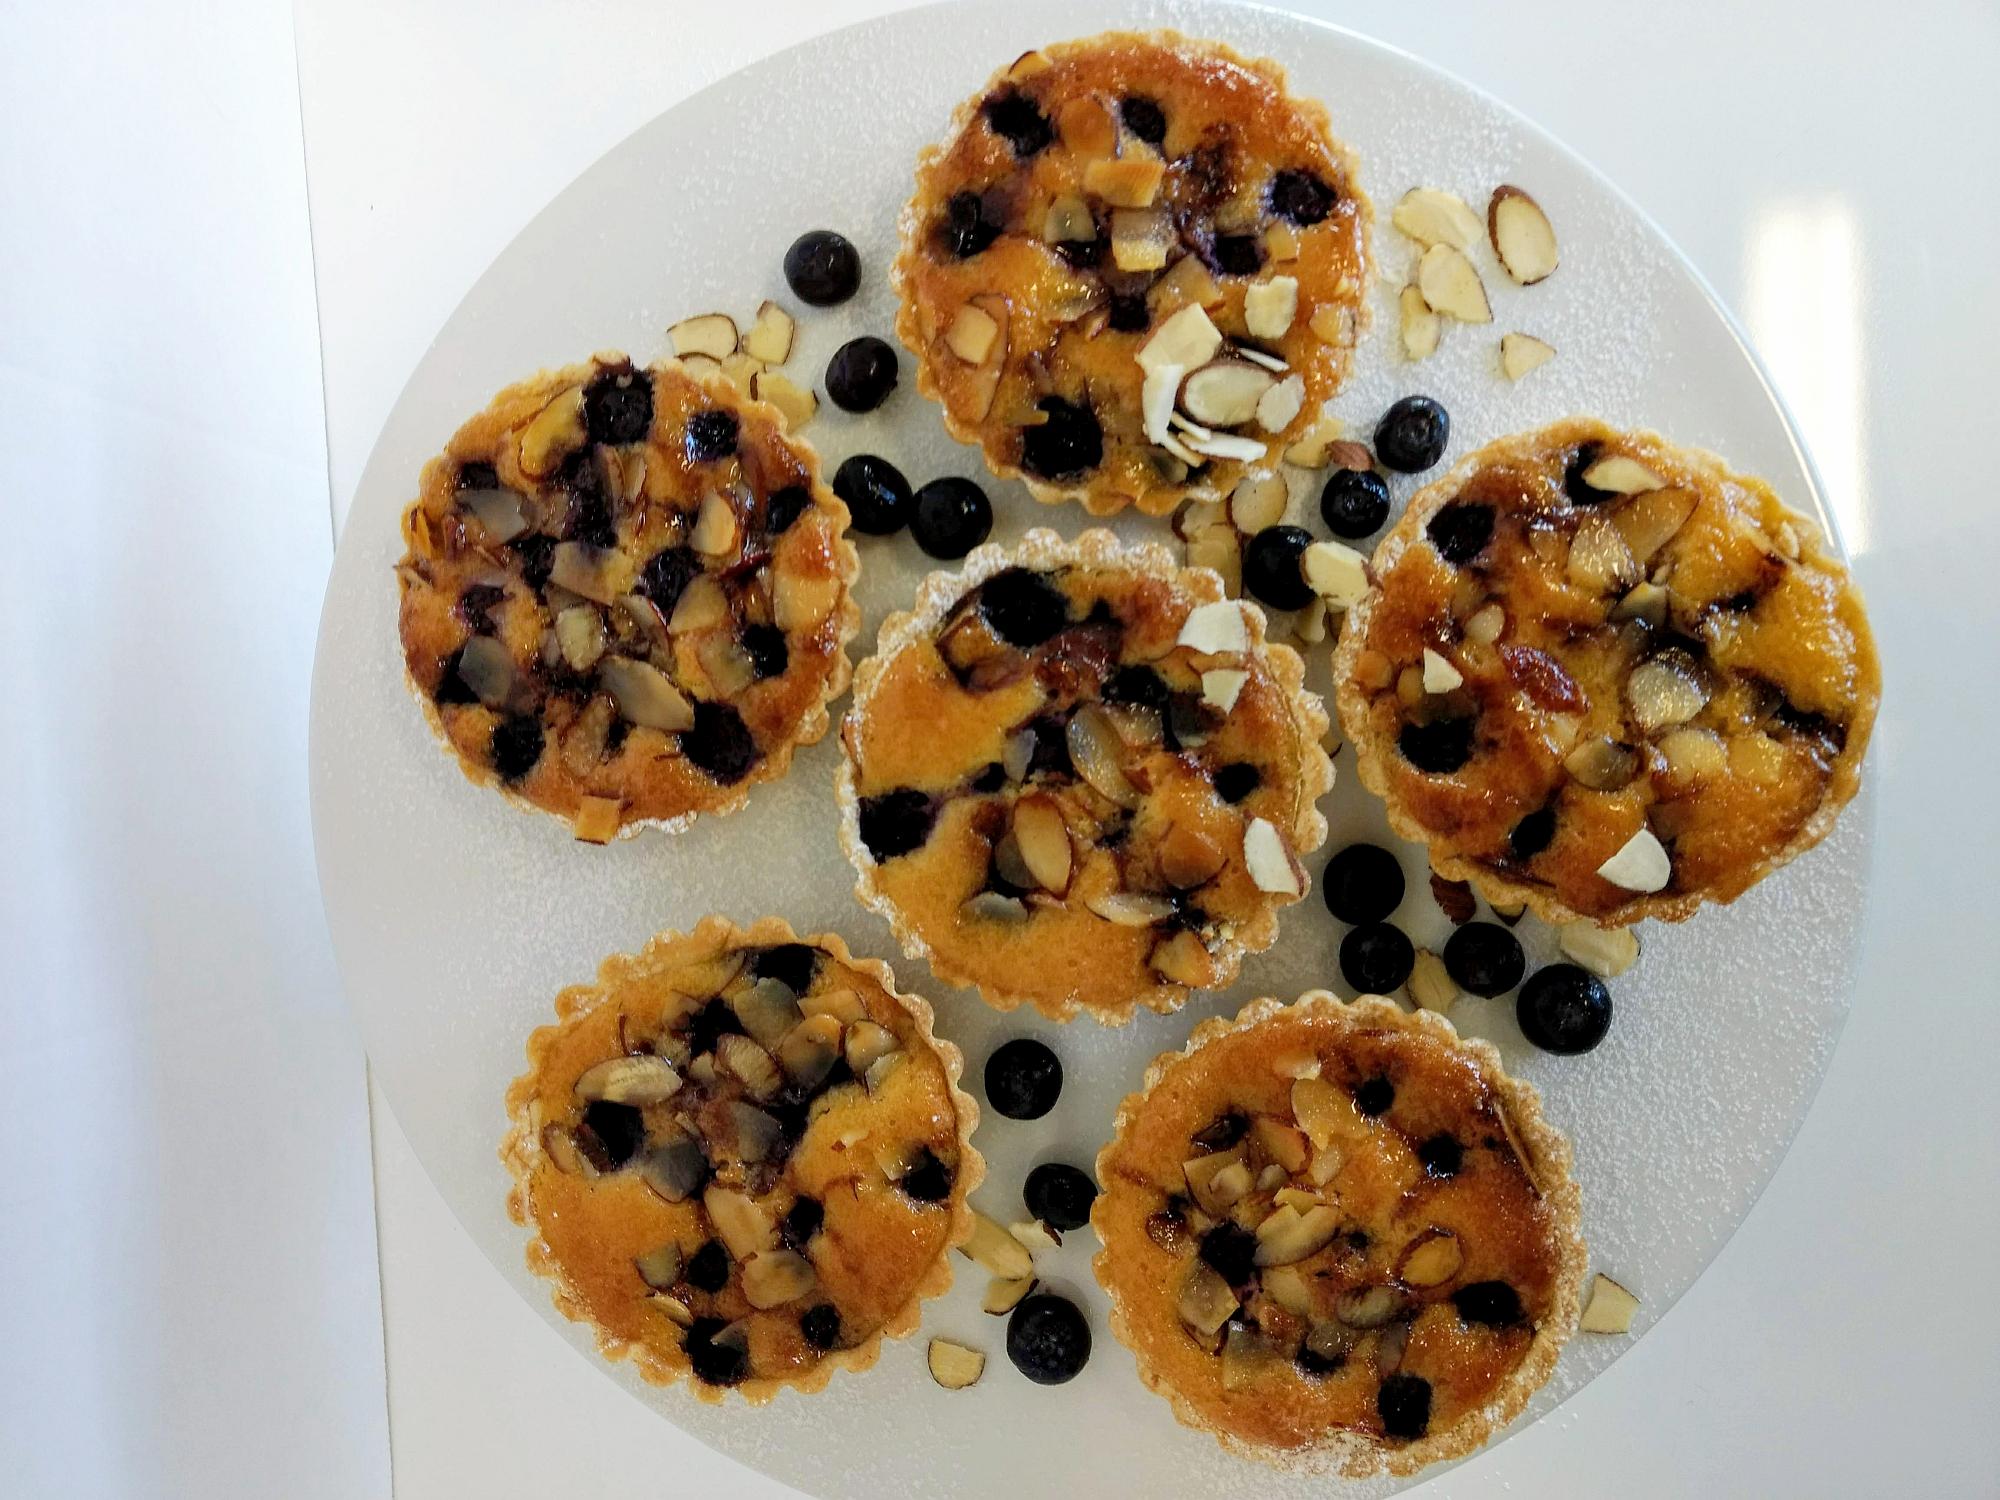 Bliss Bakery - Gluten Free